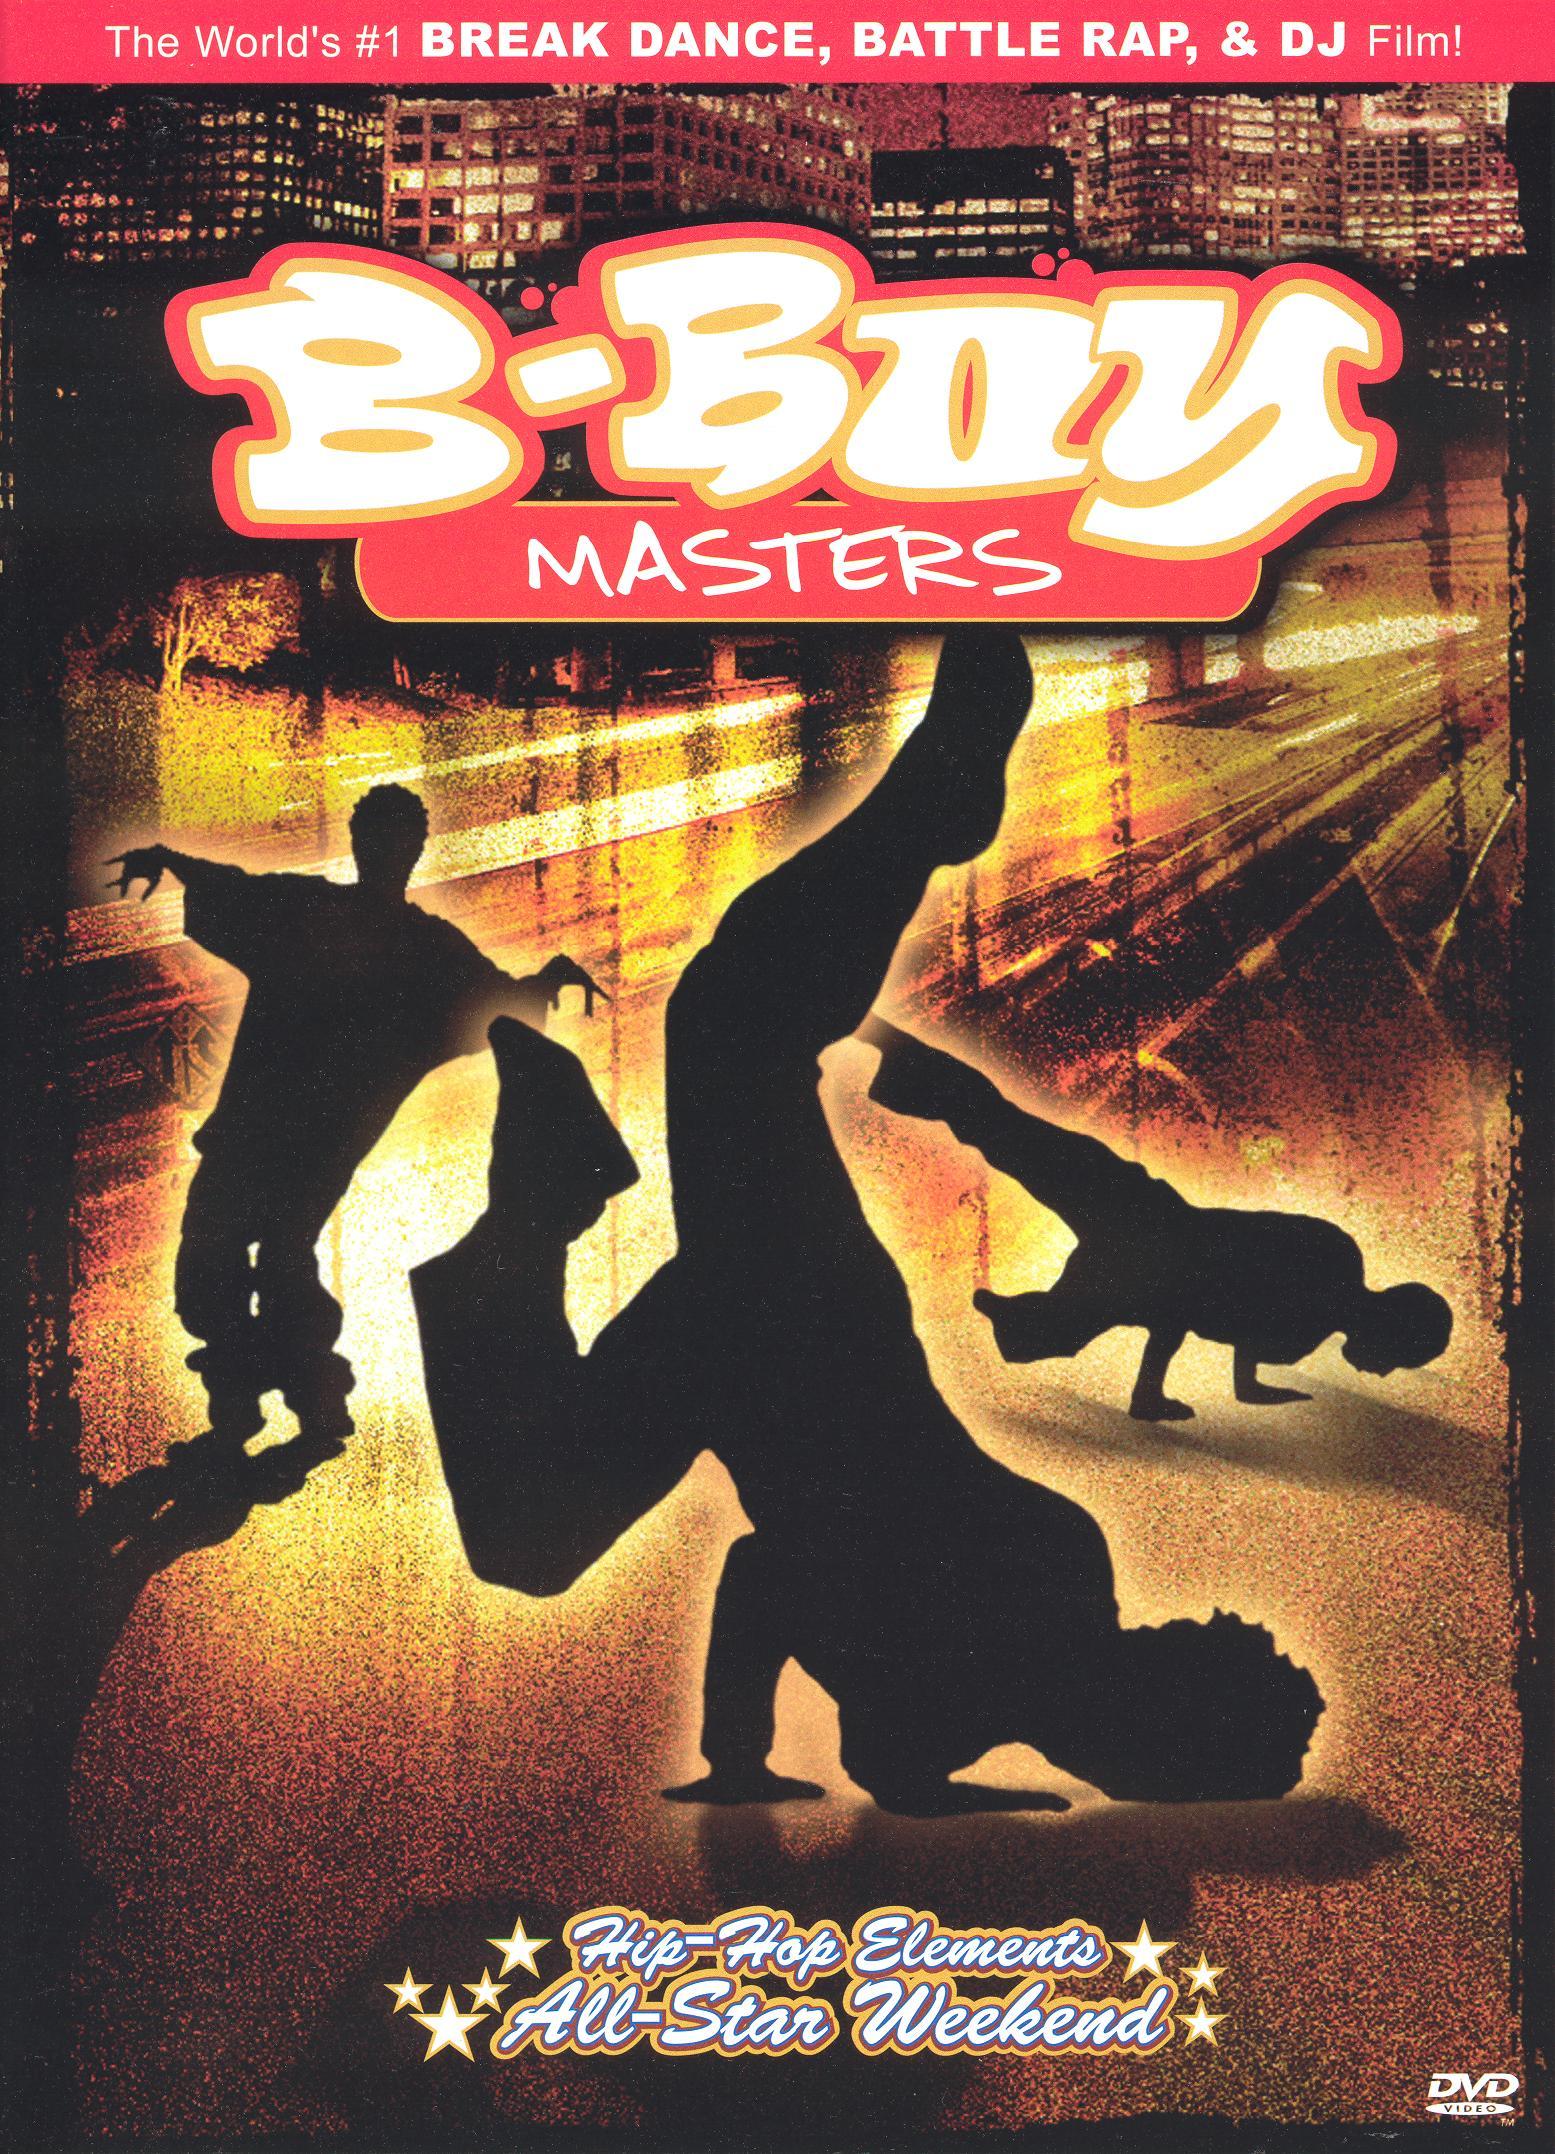 B-Boy Masters: Hip-Hop Elements All-Star Weekend